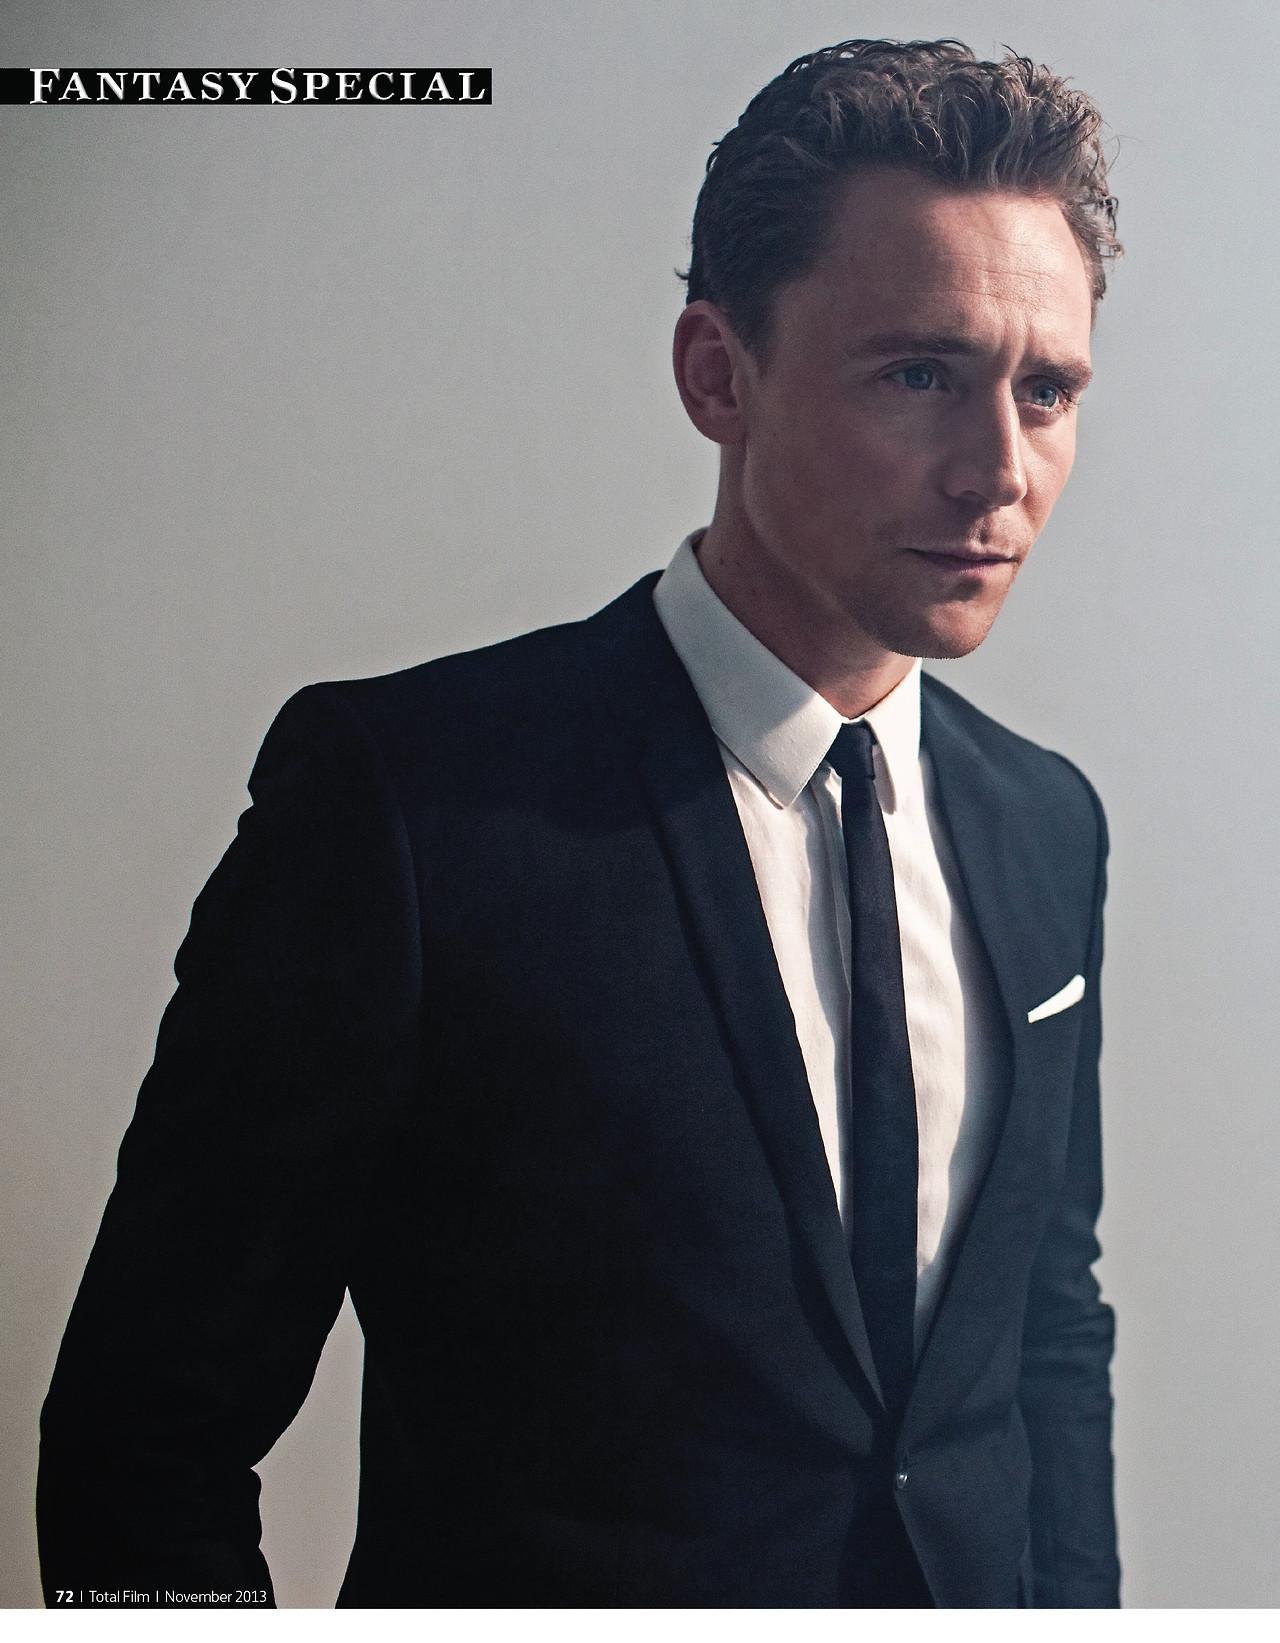 Tom Hiddleston The Hollow Crown Photoshoot